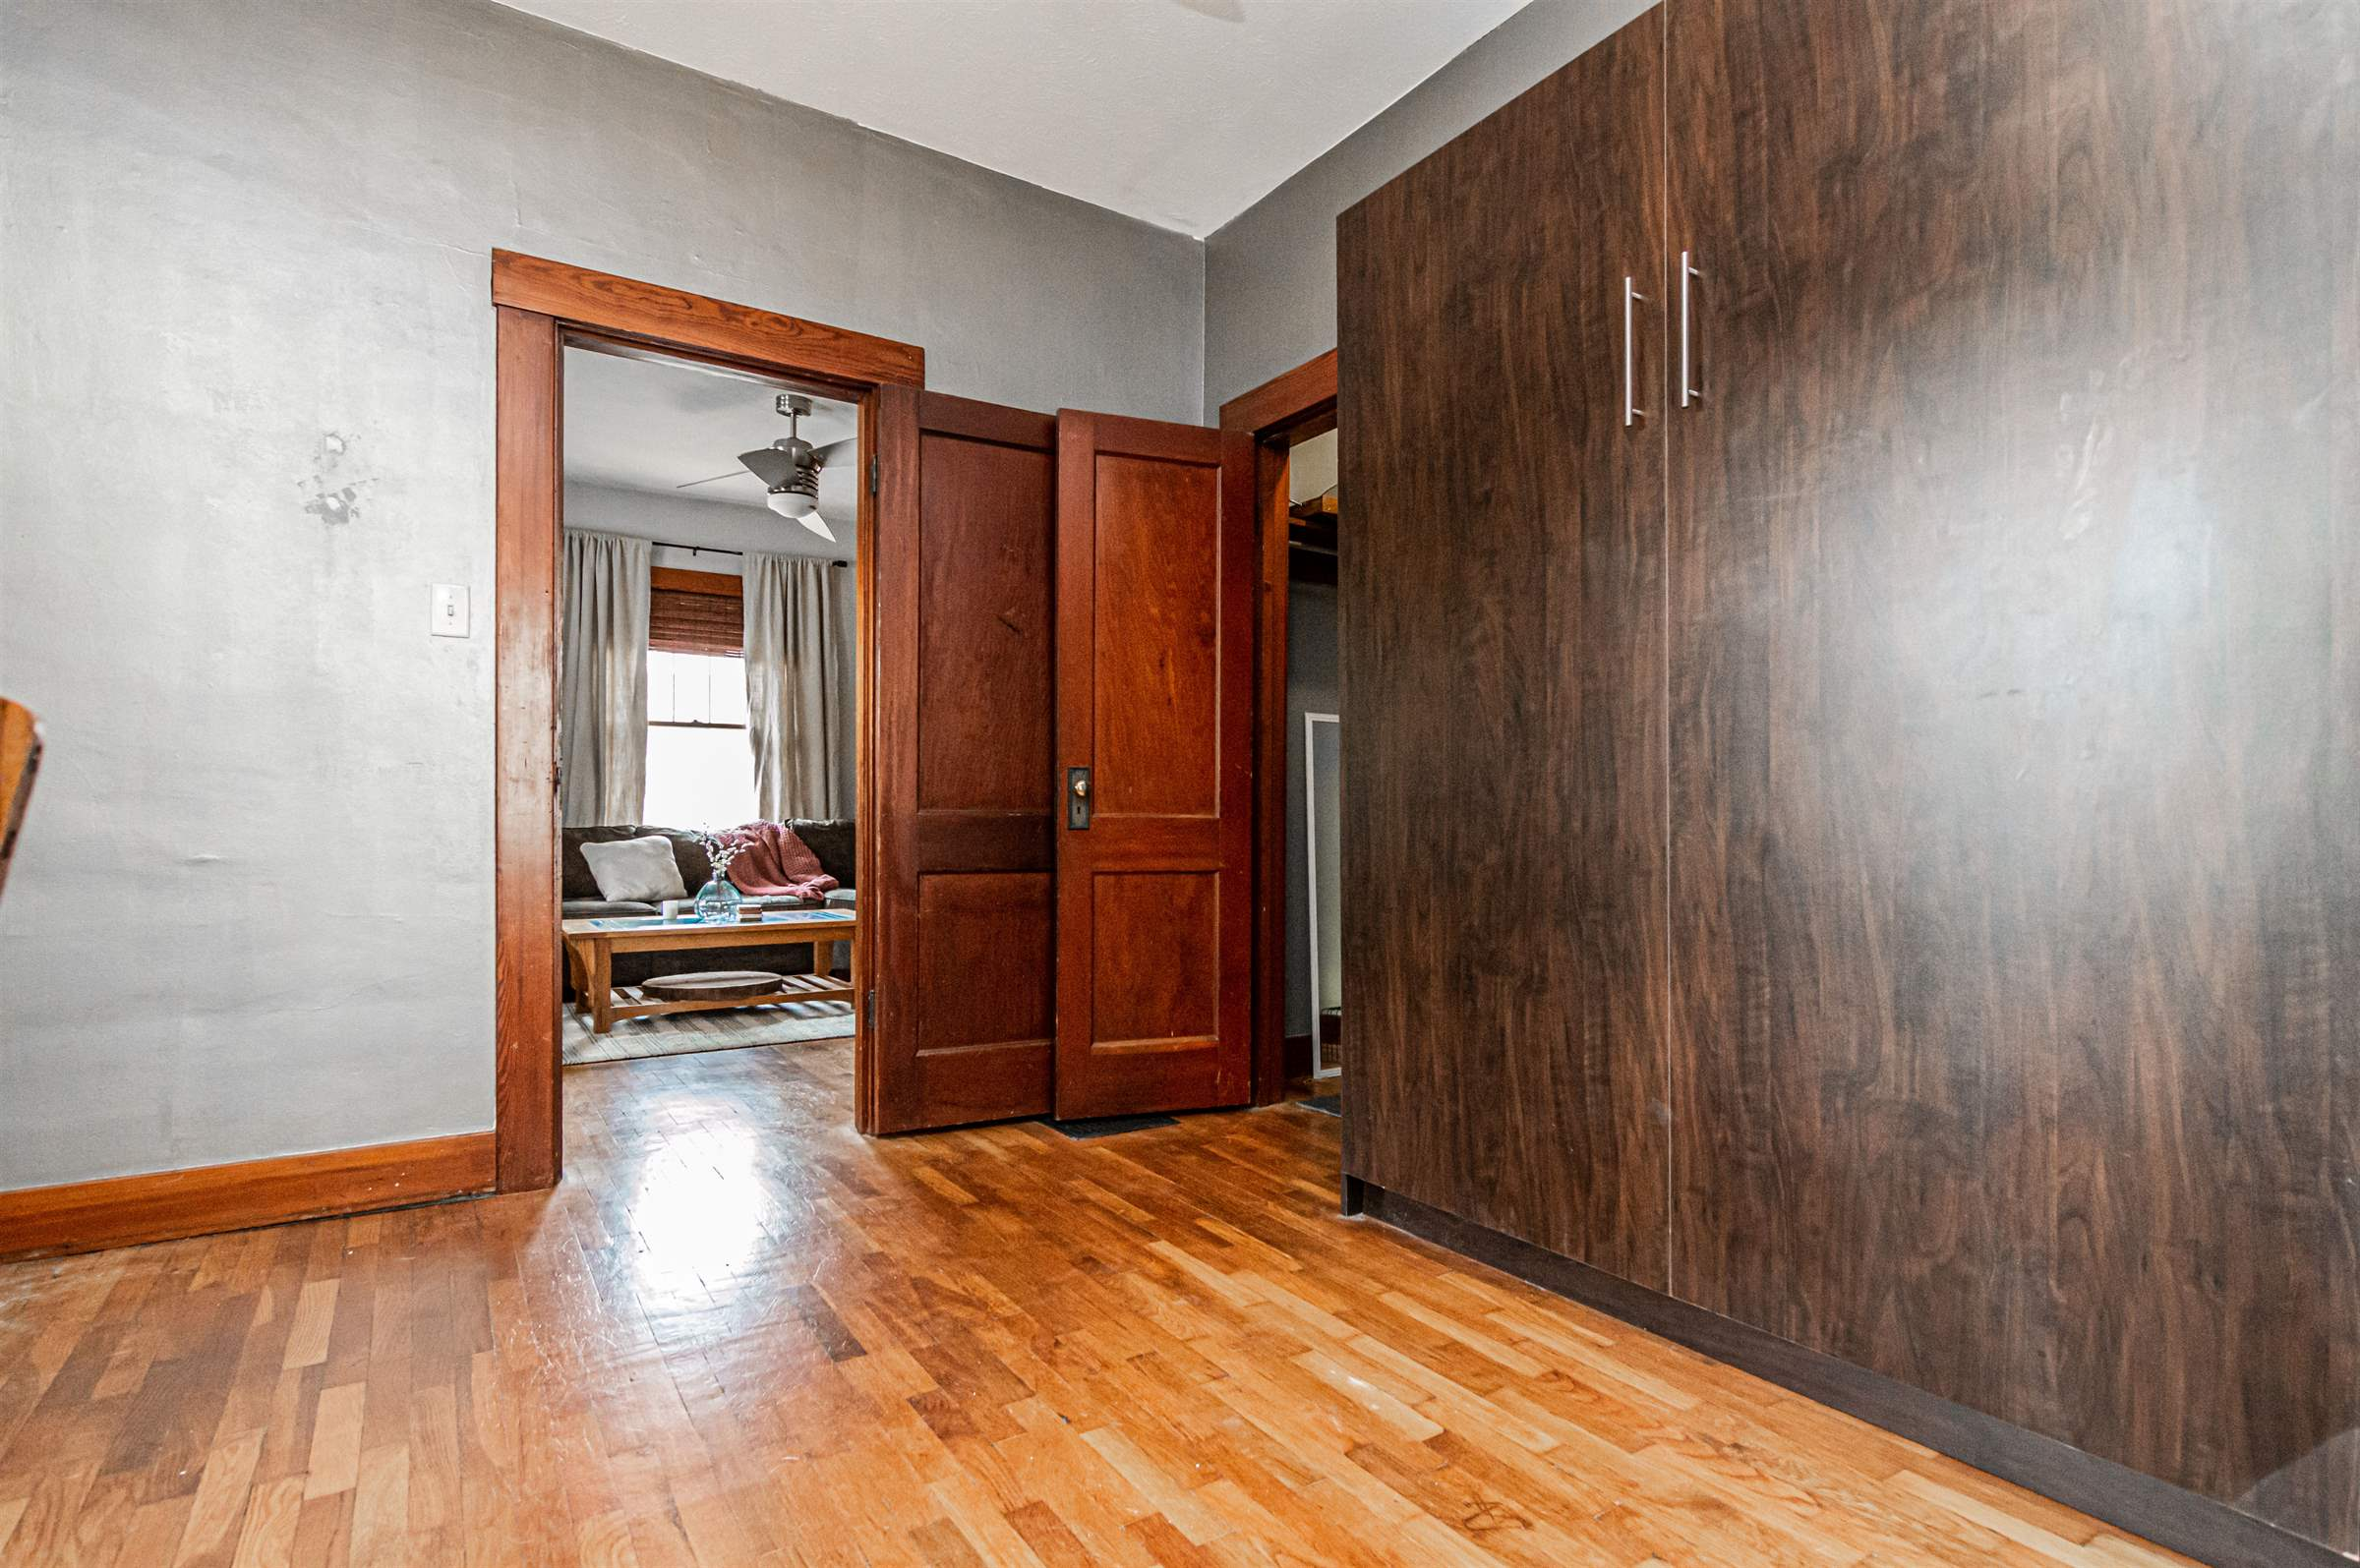 314 S Martin Luther King Jr. Drive, Manhattan, KS 66502